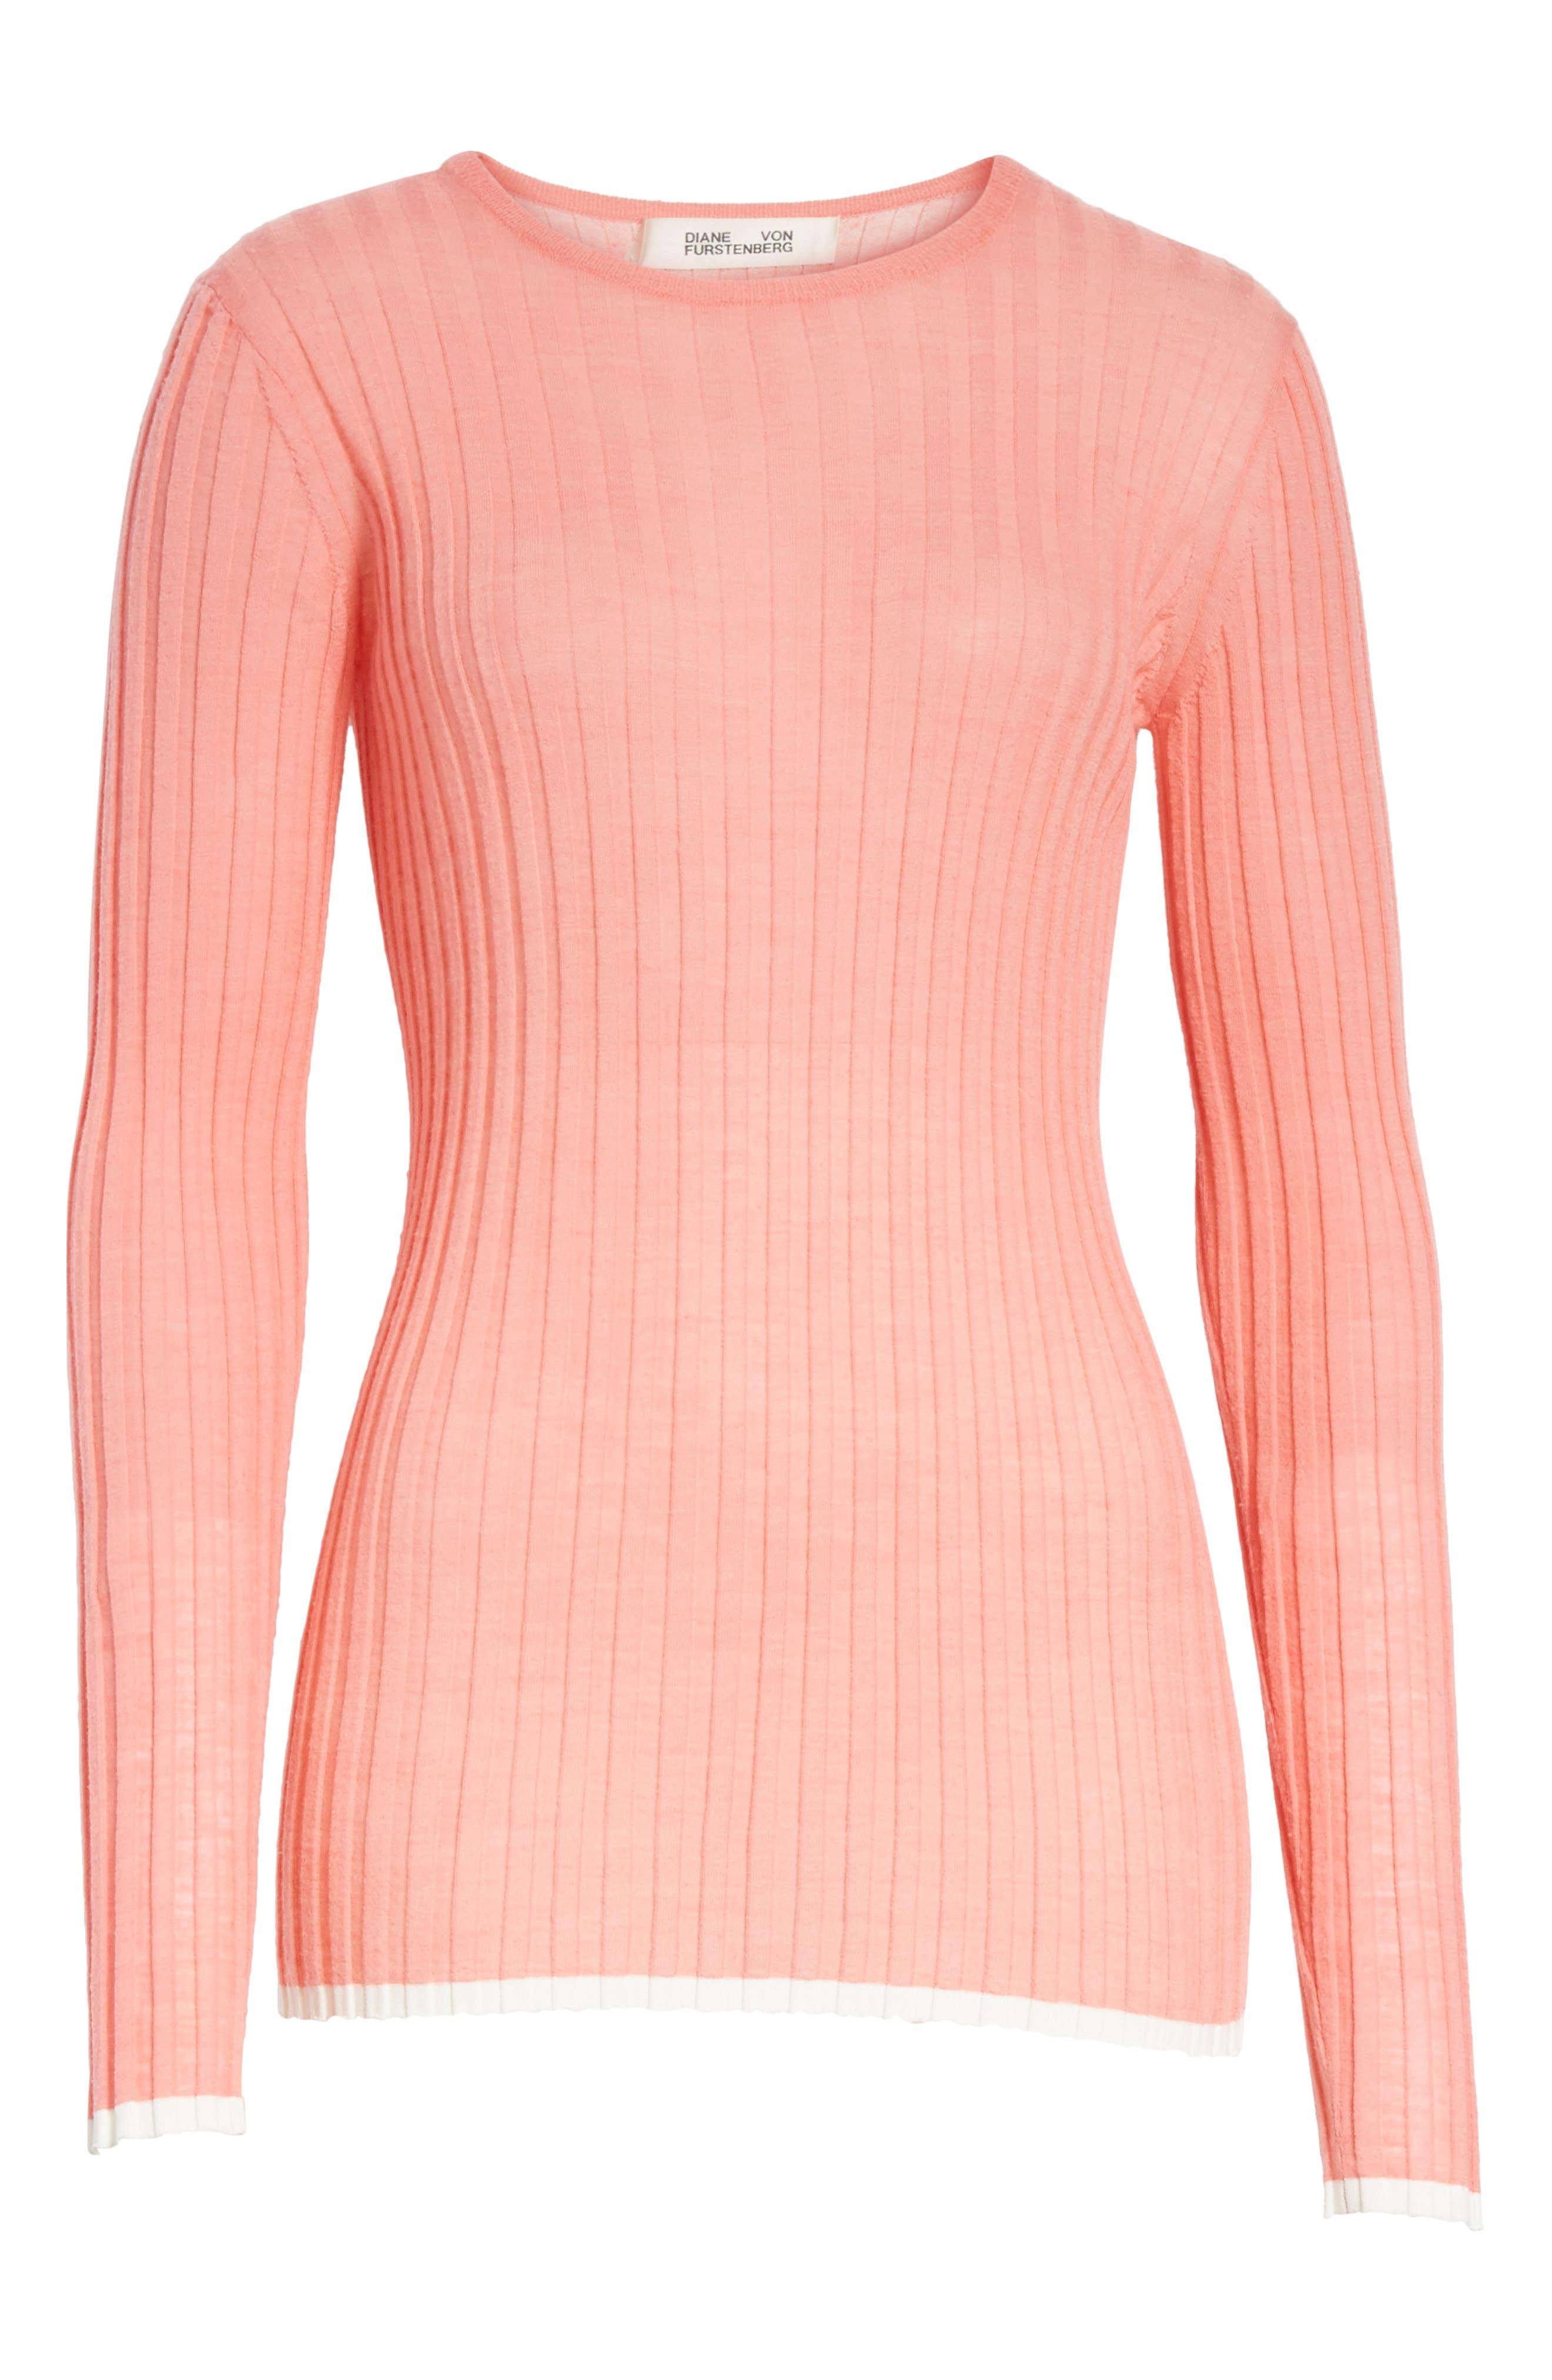 Diane von Furstenberg Ribbed Sweater,                             Alternate thumbnail 6, color,                             670